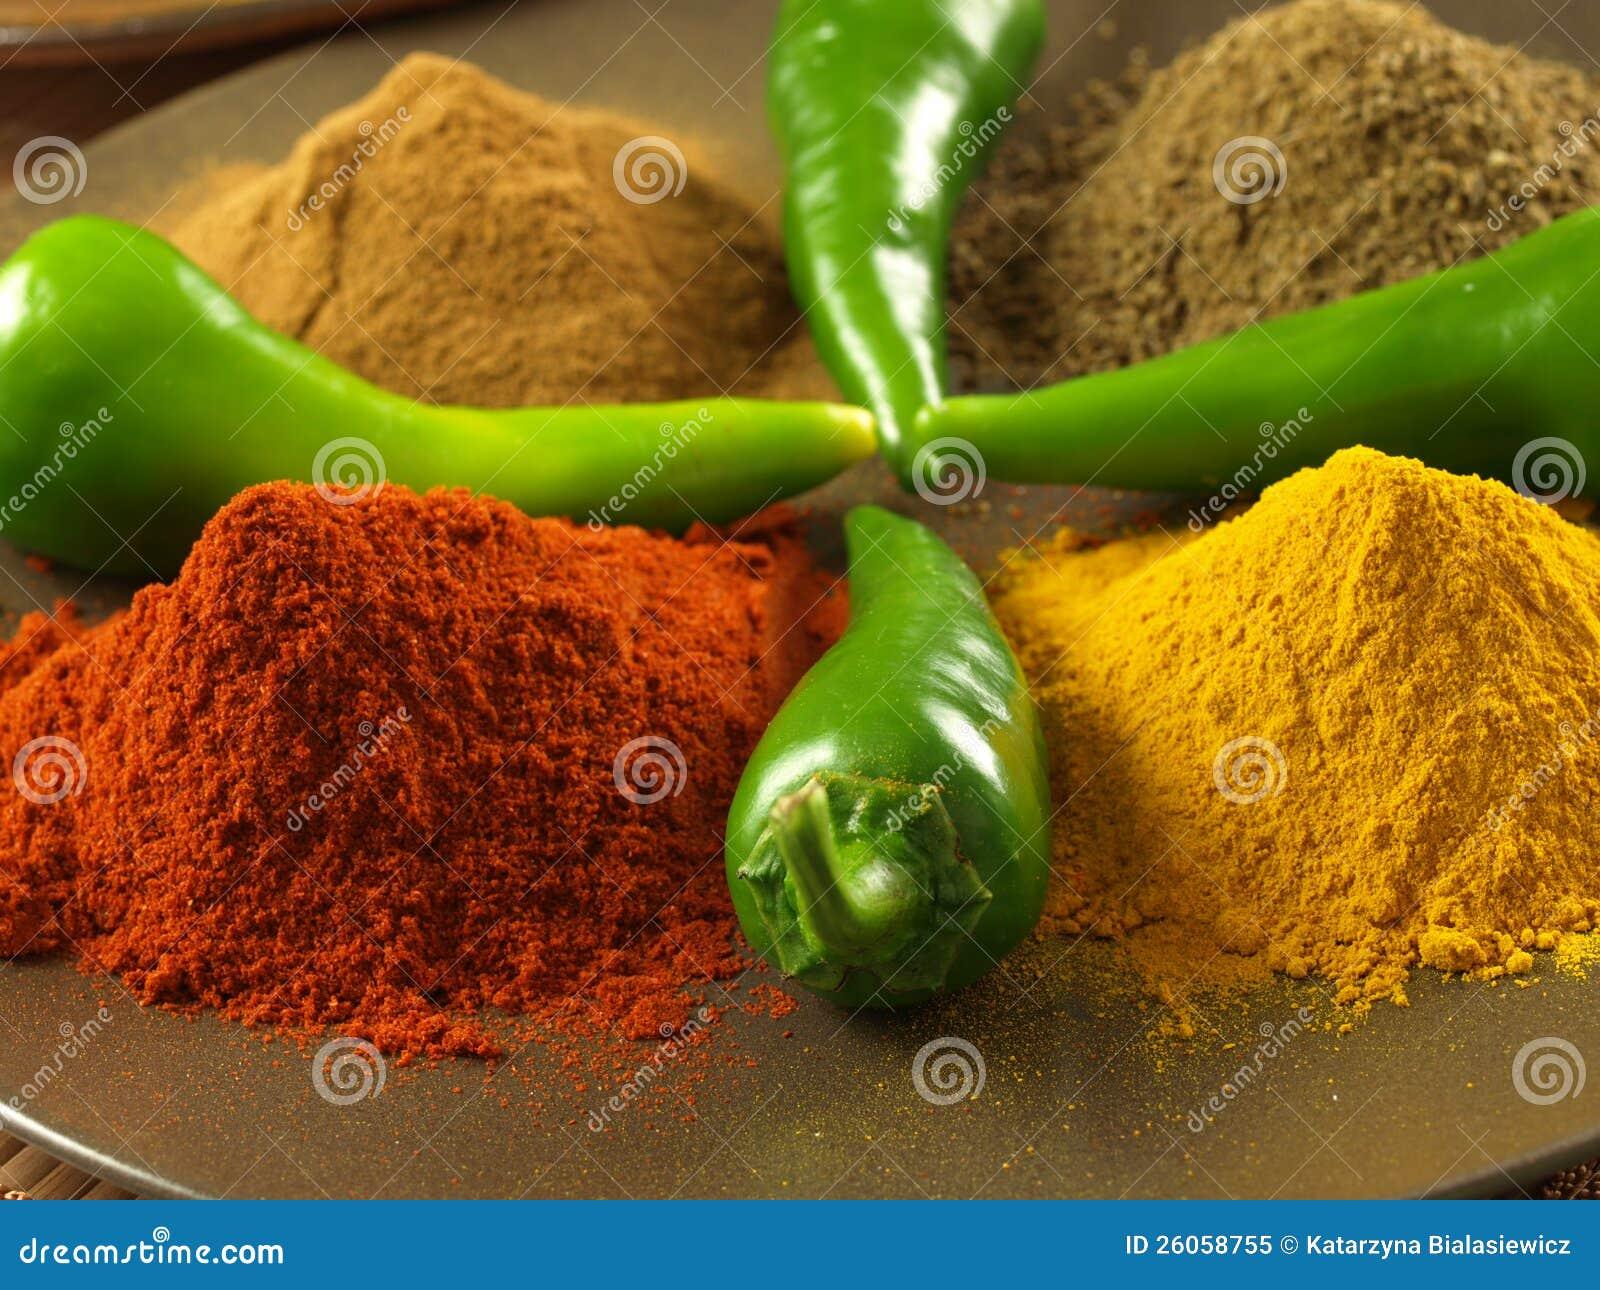 Перец, турмерин, тимон и циннамон